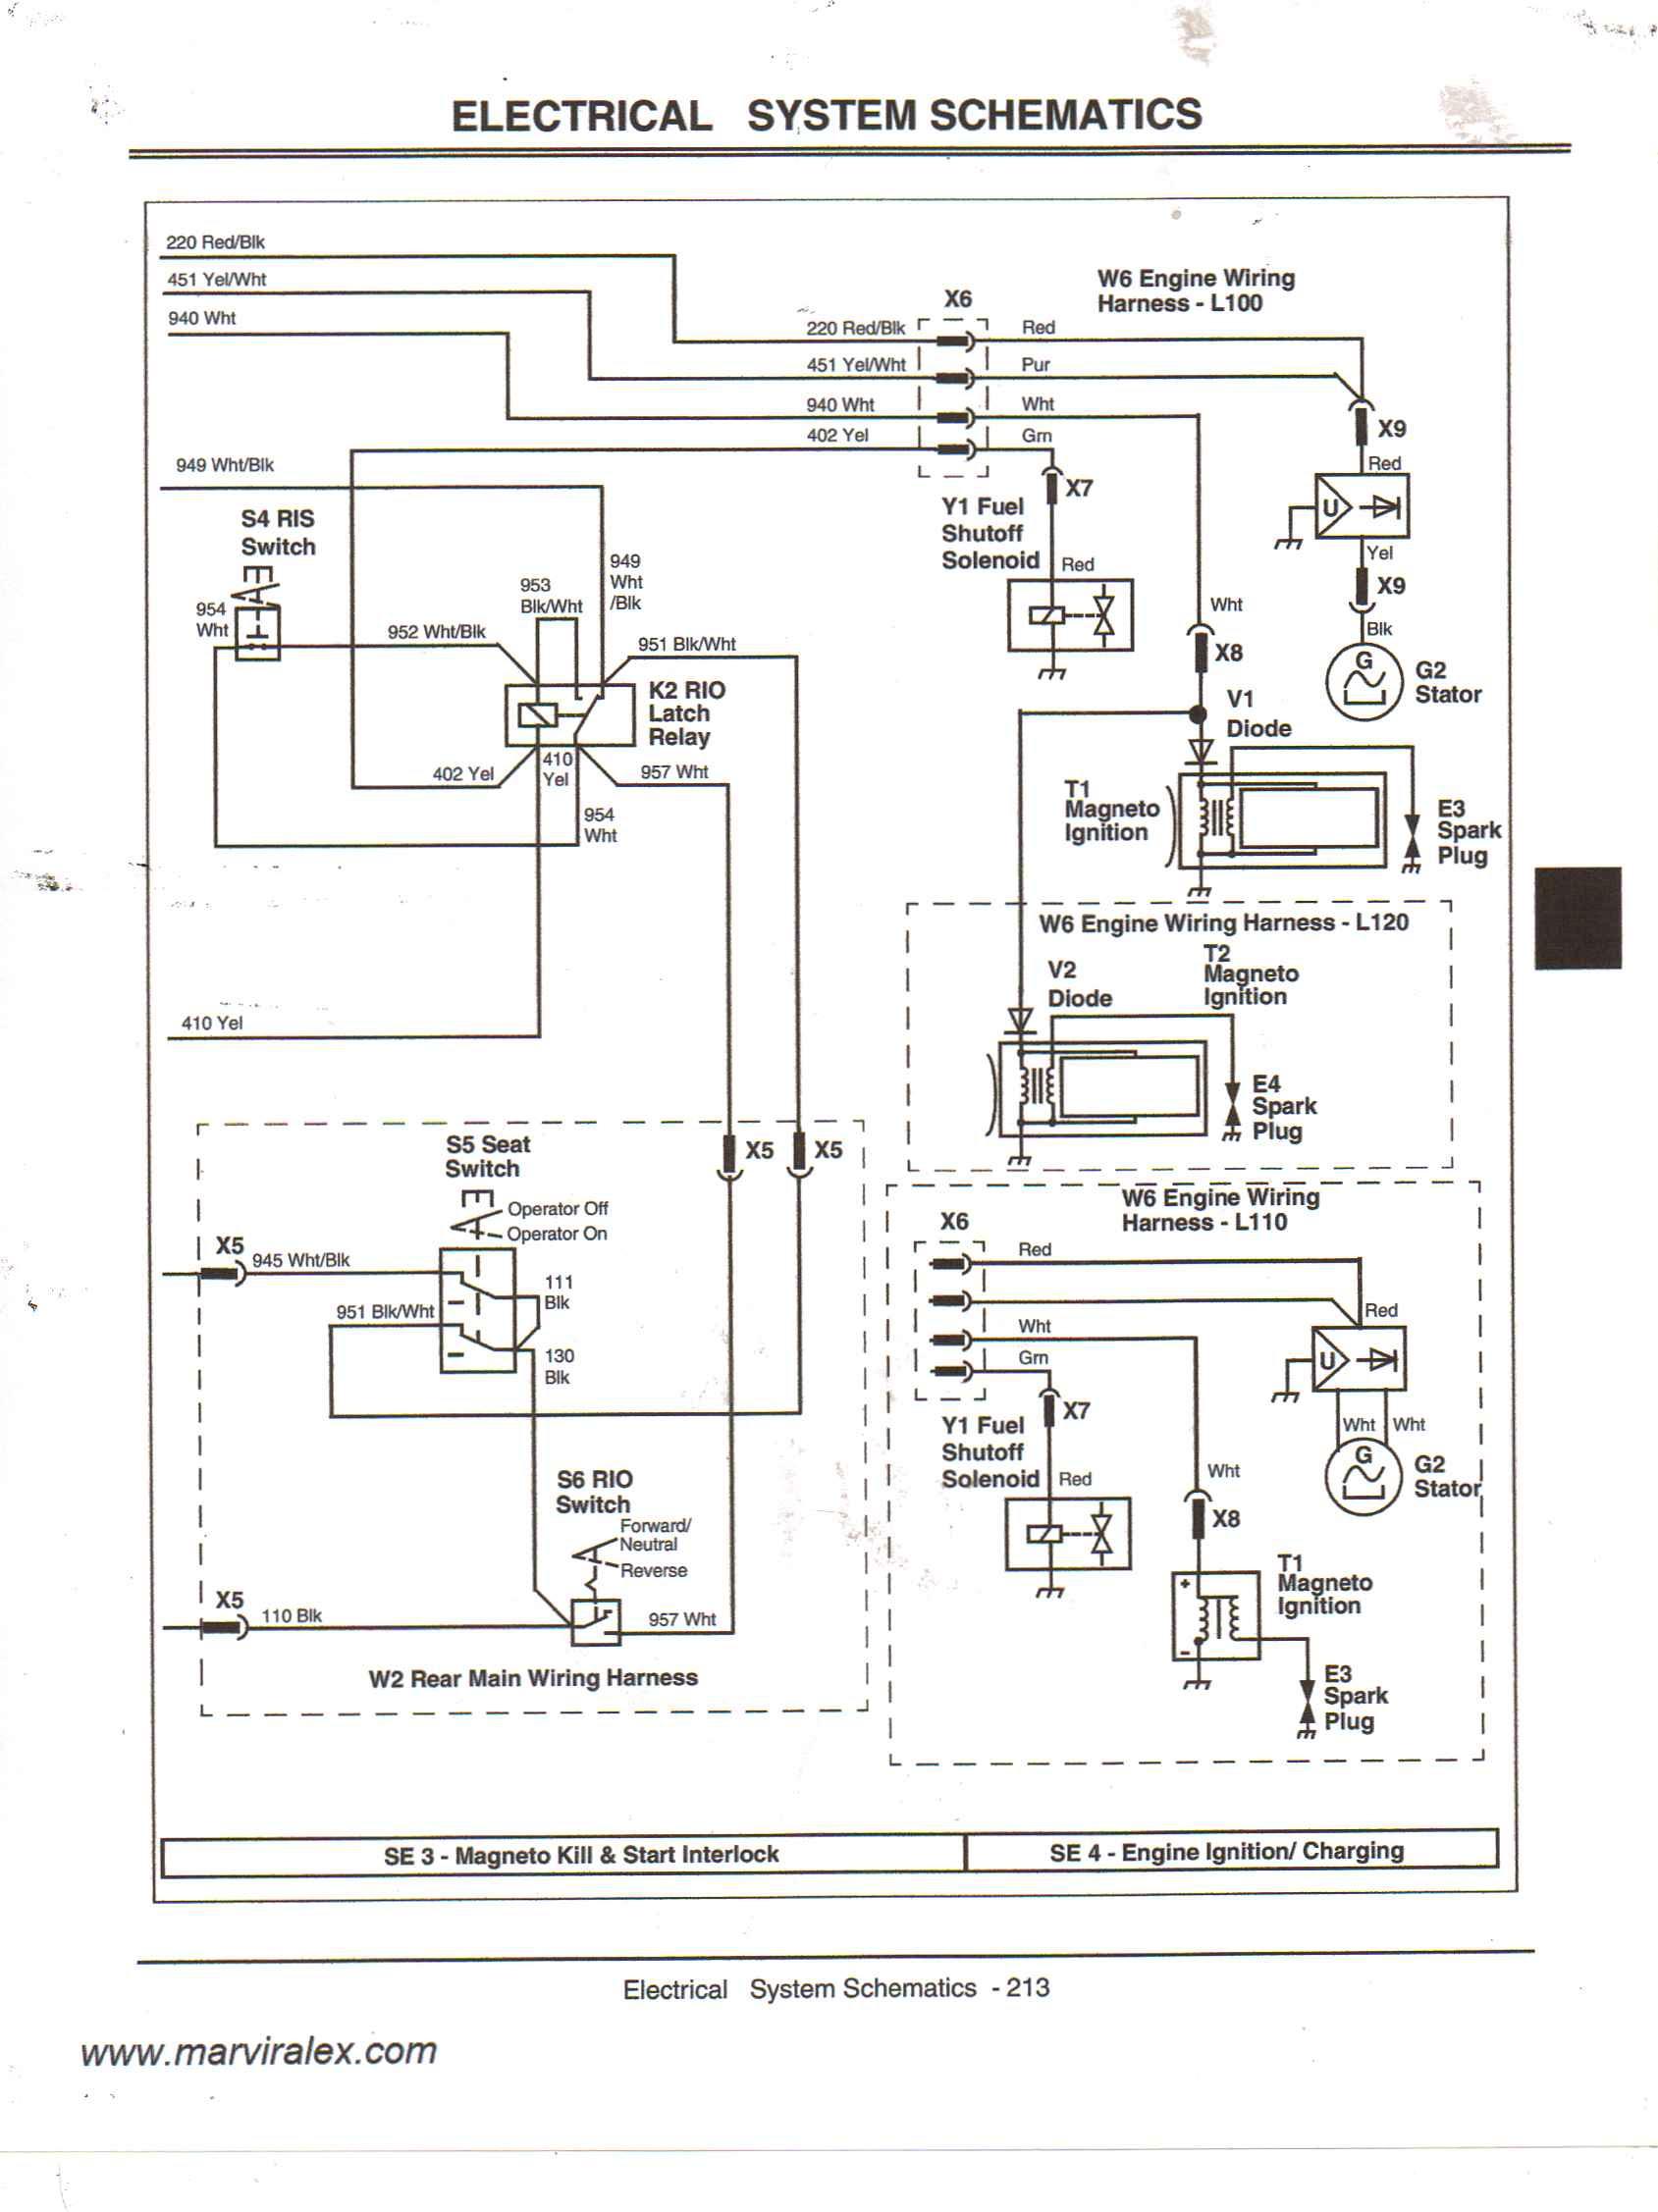 John Deere Lt150 Parts Diagram - Wiring Site ResourceWiring Site Resource